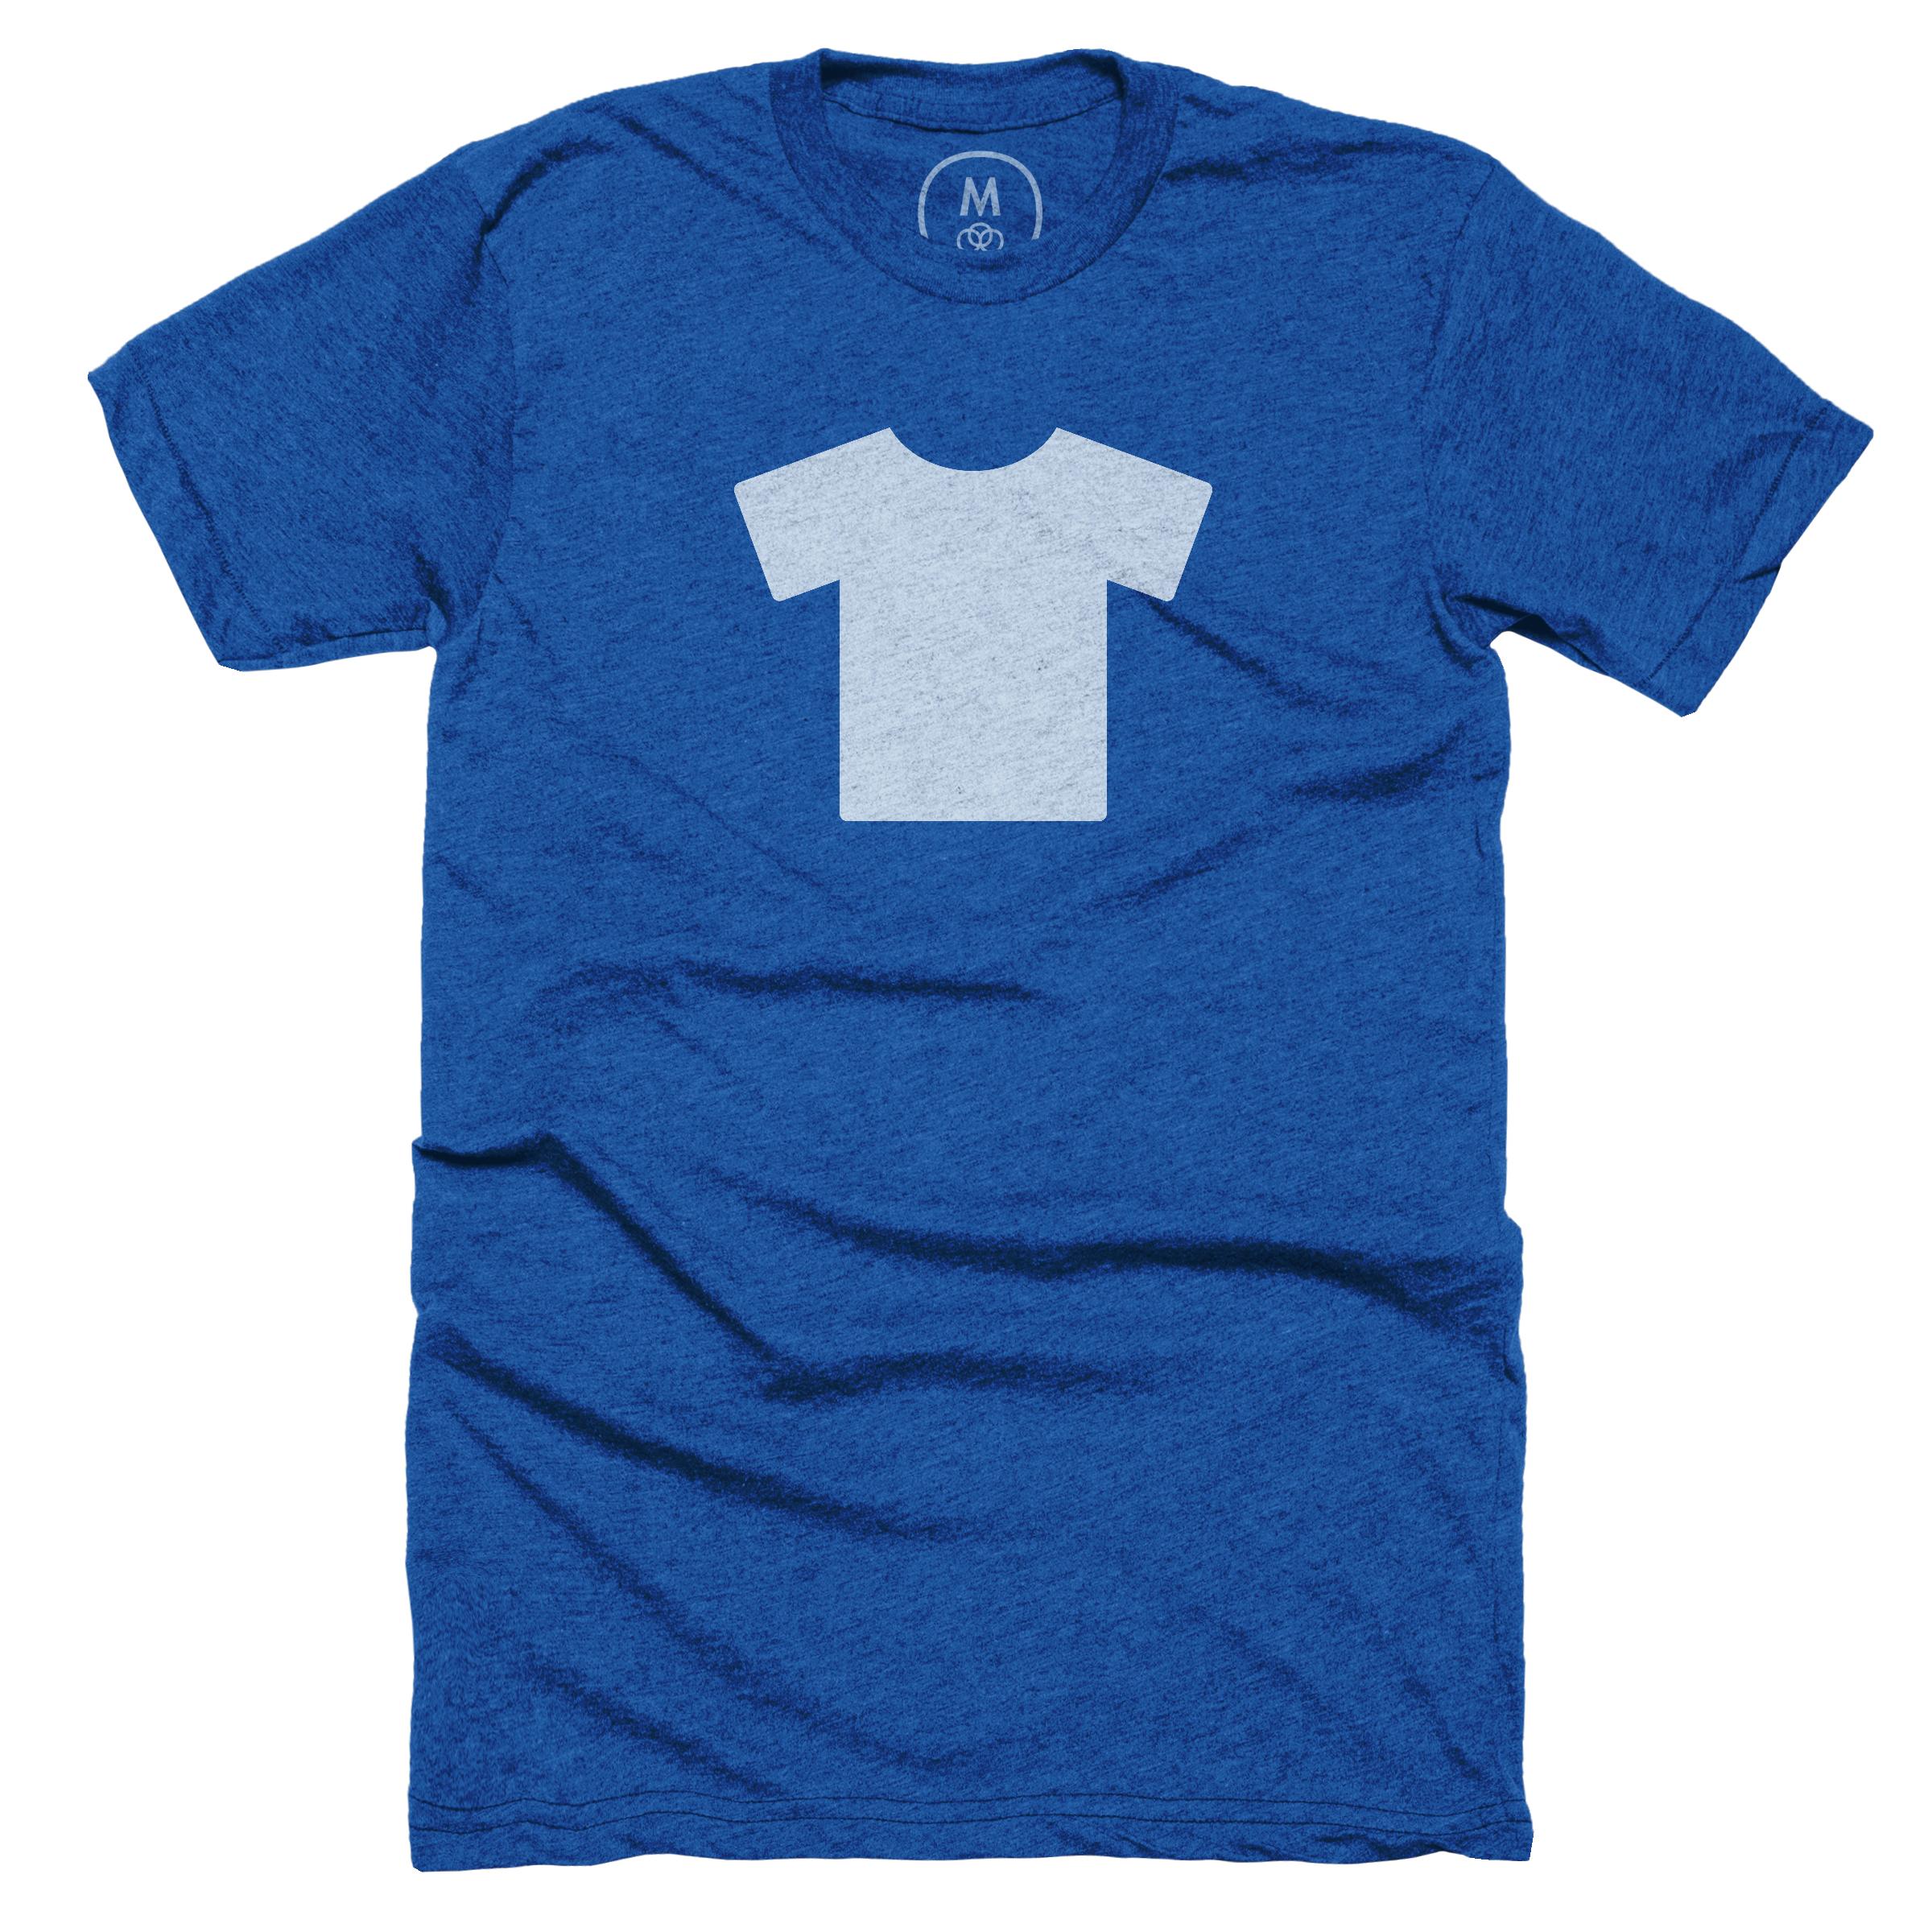 T-Shirt Royal (Men's)